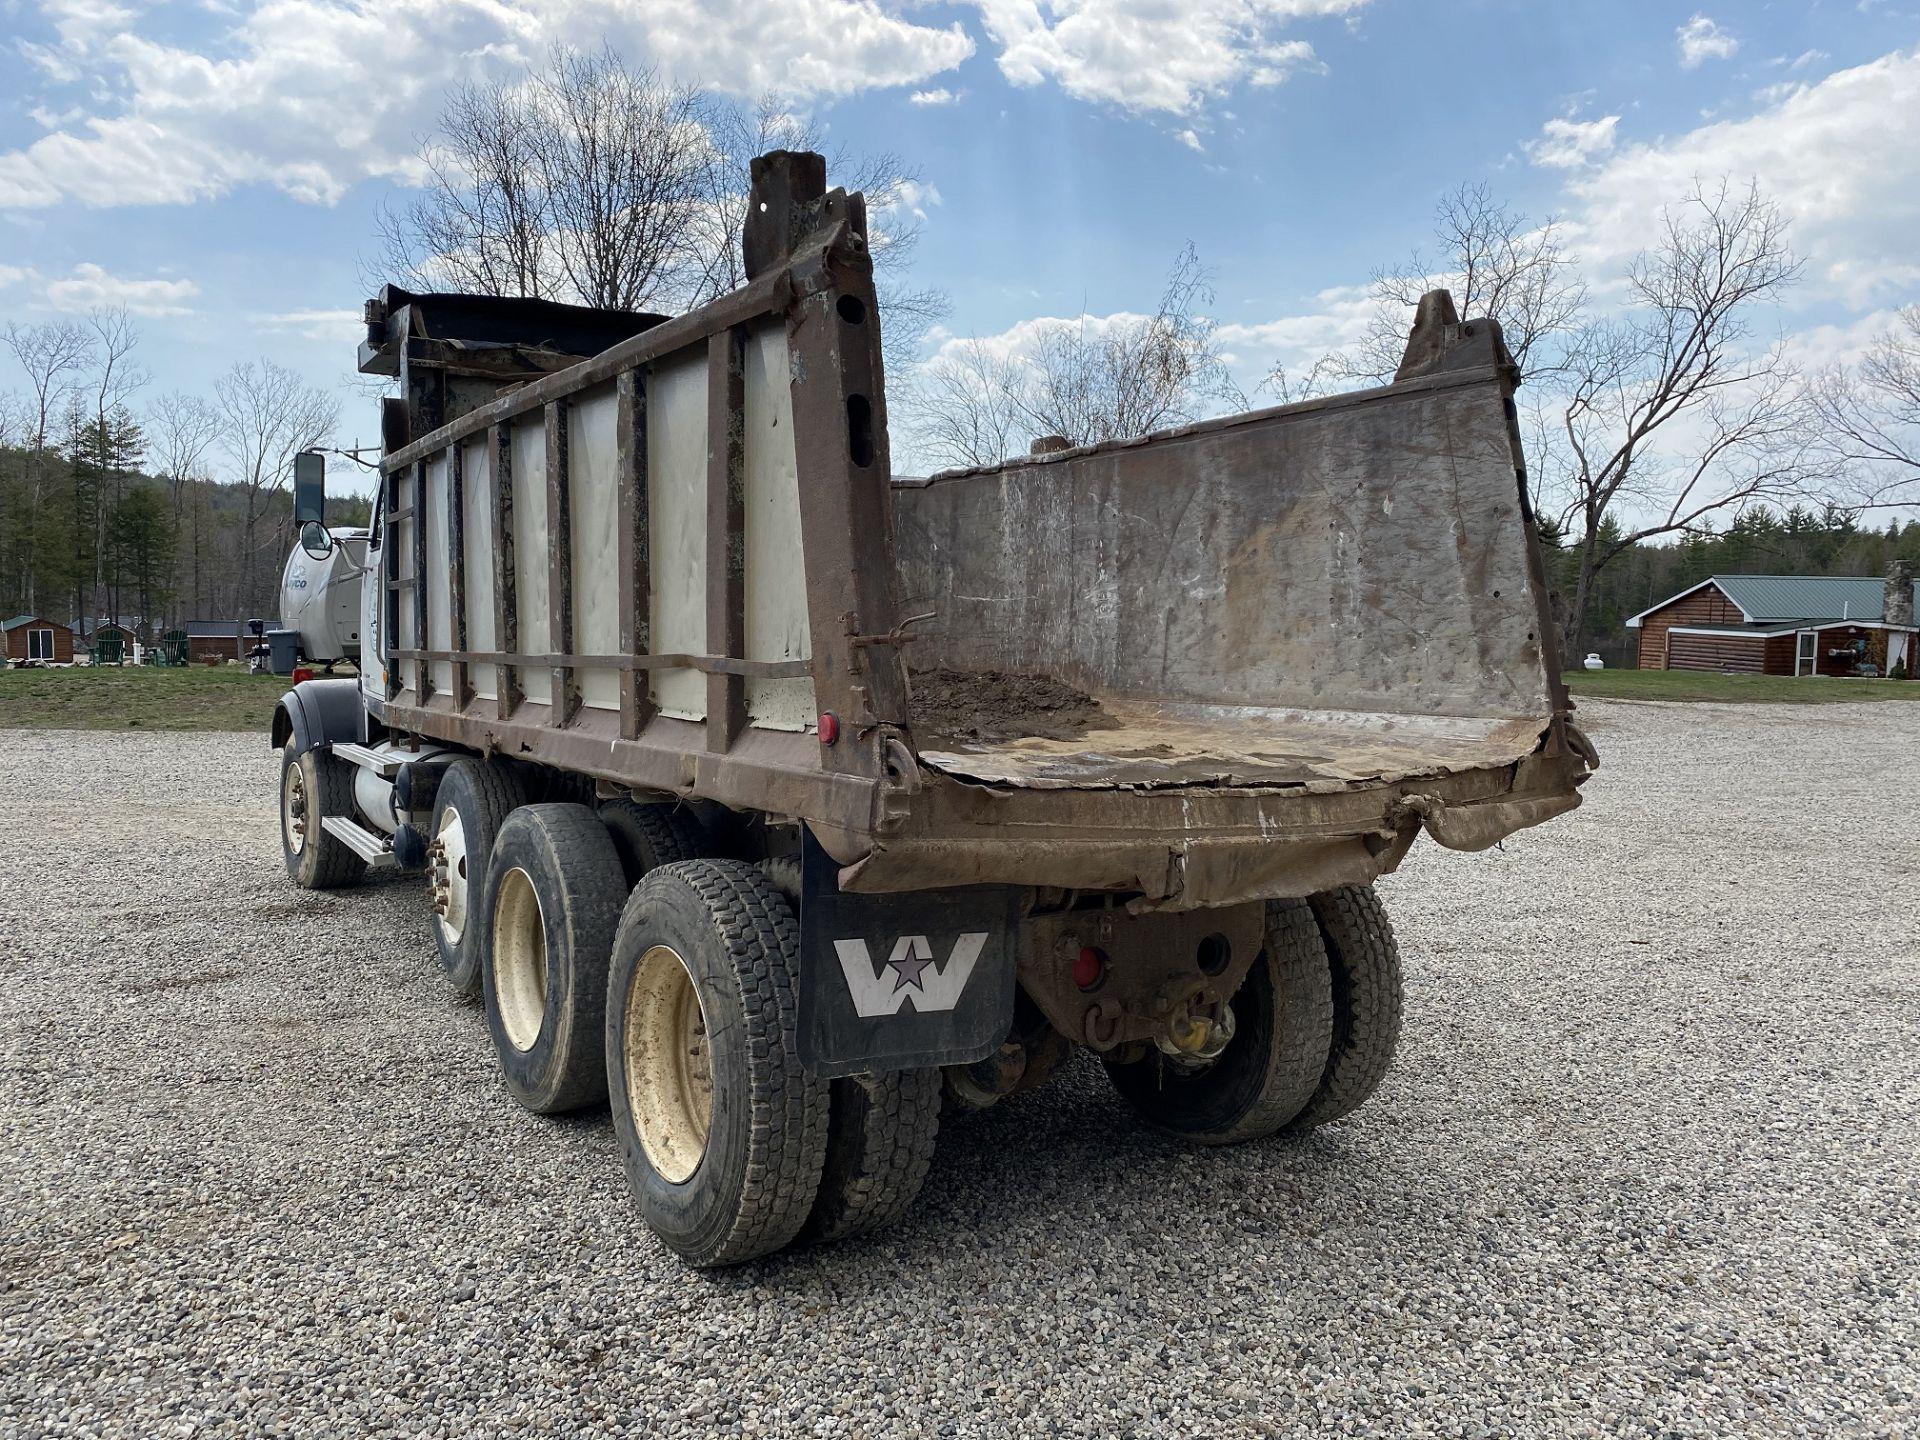 2000 Western Star 12 Wheel Dump w/ Drop Axle, Cat Diesel C10 6 CYL. 78,000 GVWR, ODOM 323,142, - Image 4 of 8